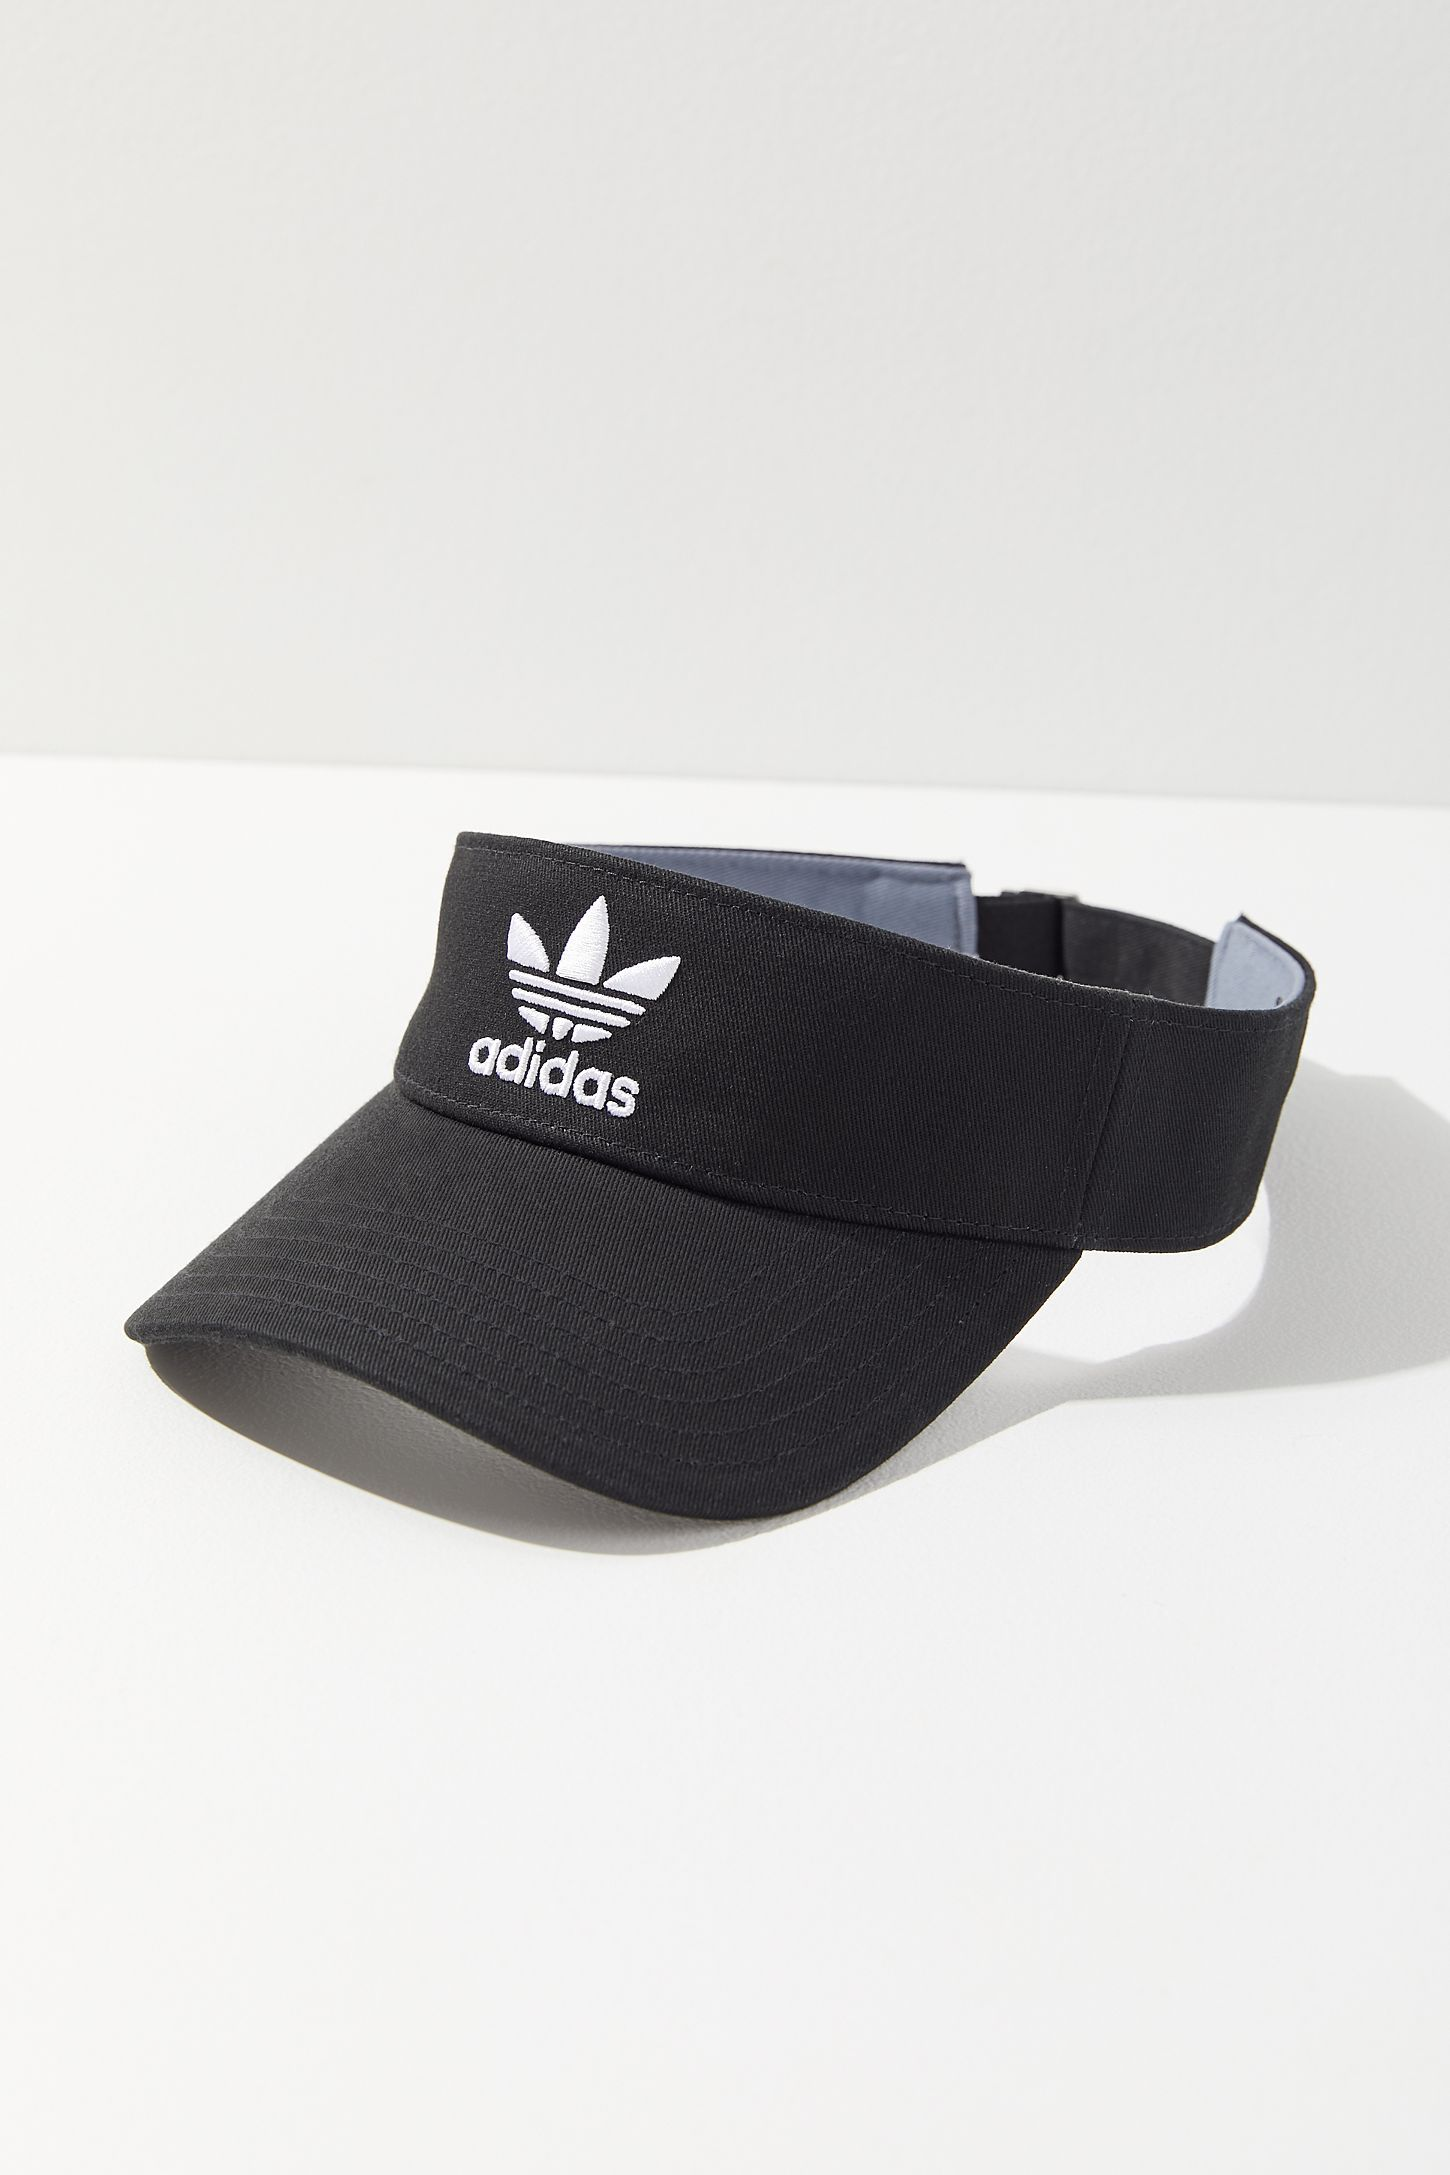 e53cc181 adidas Originals Twill Visor in 2019 | Things I want | Adidas ...